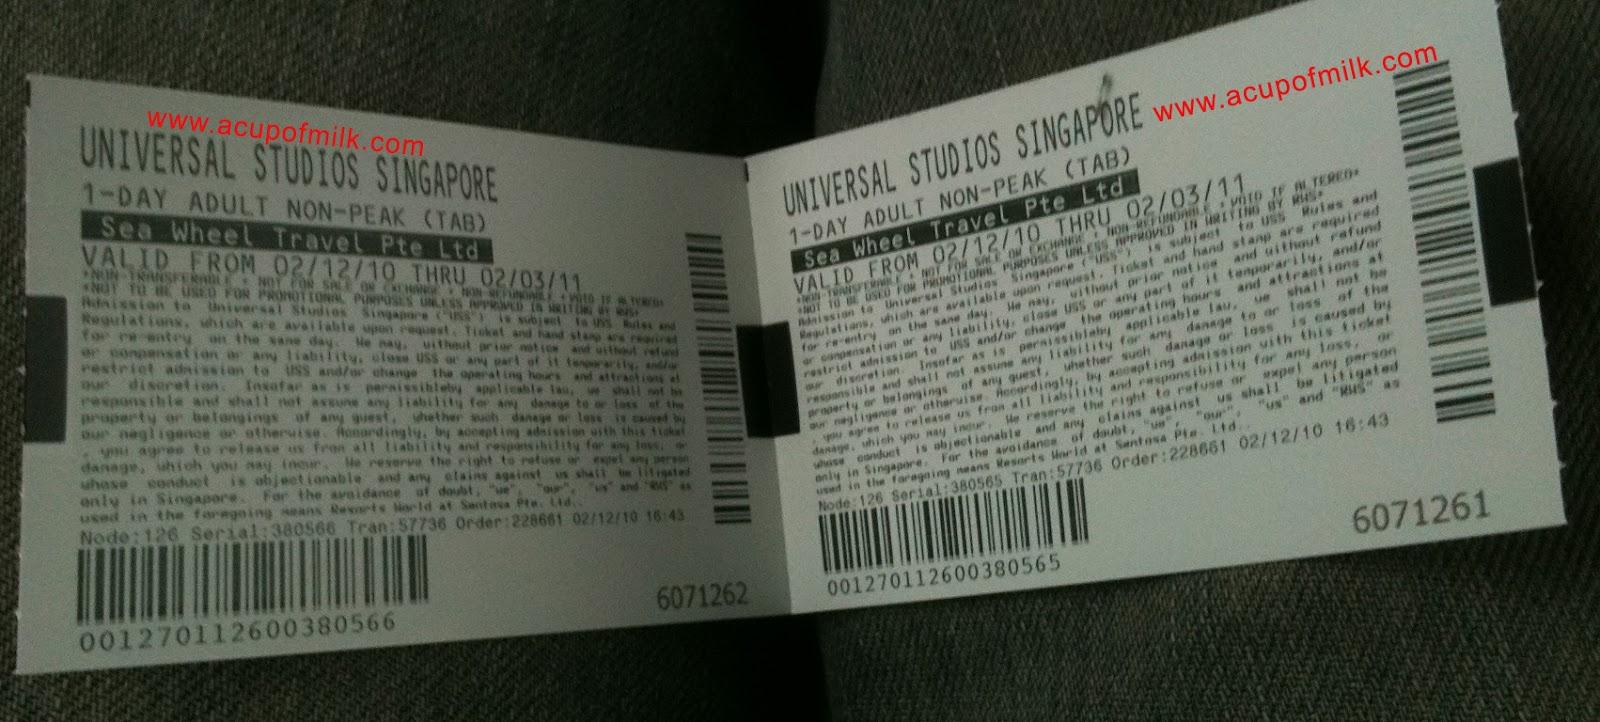 Universal studios singapore coupons